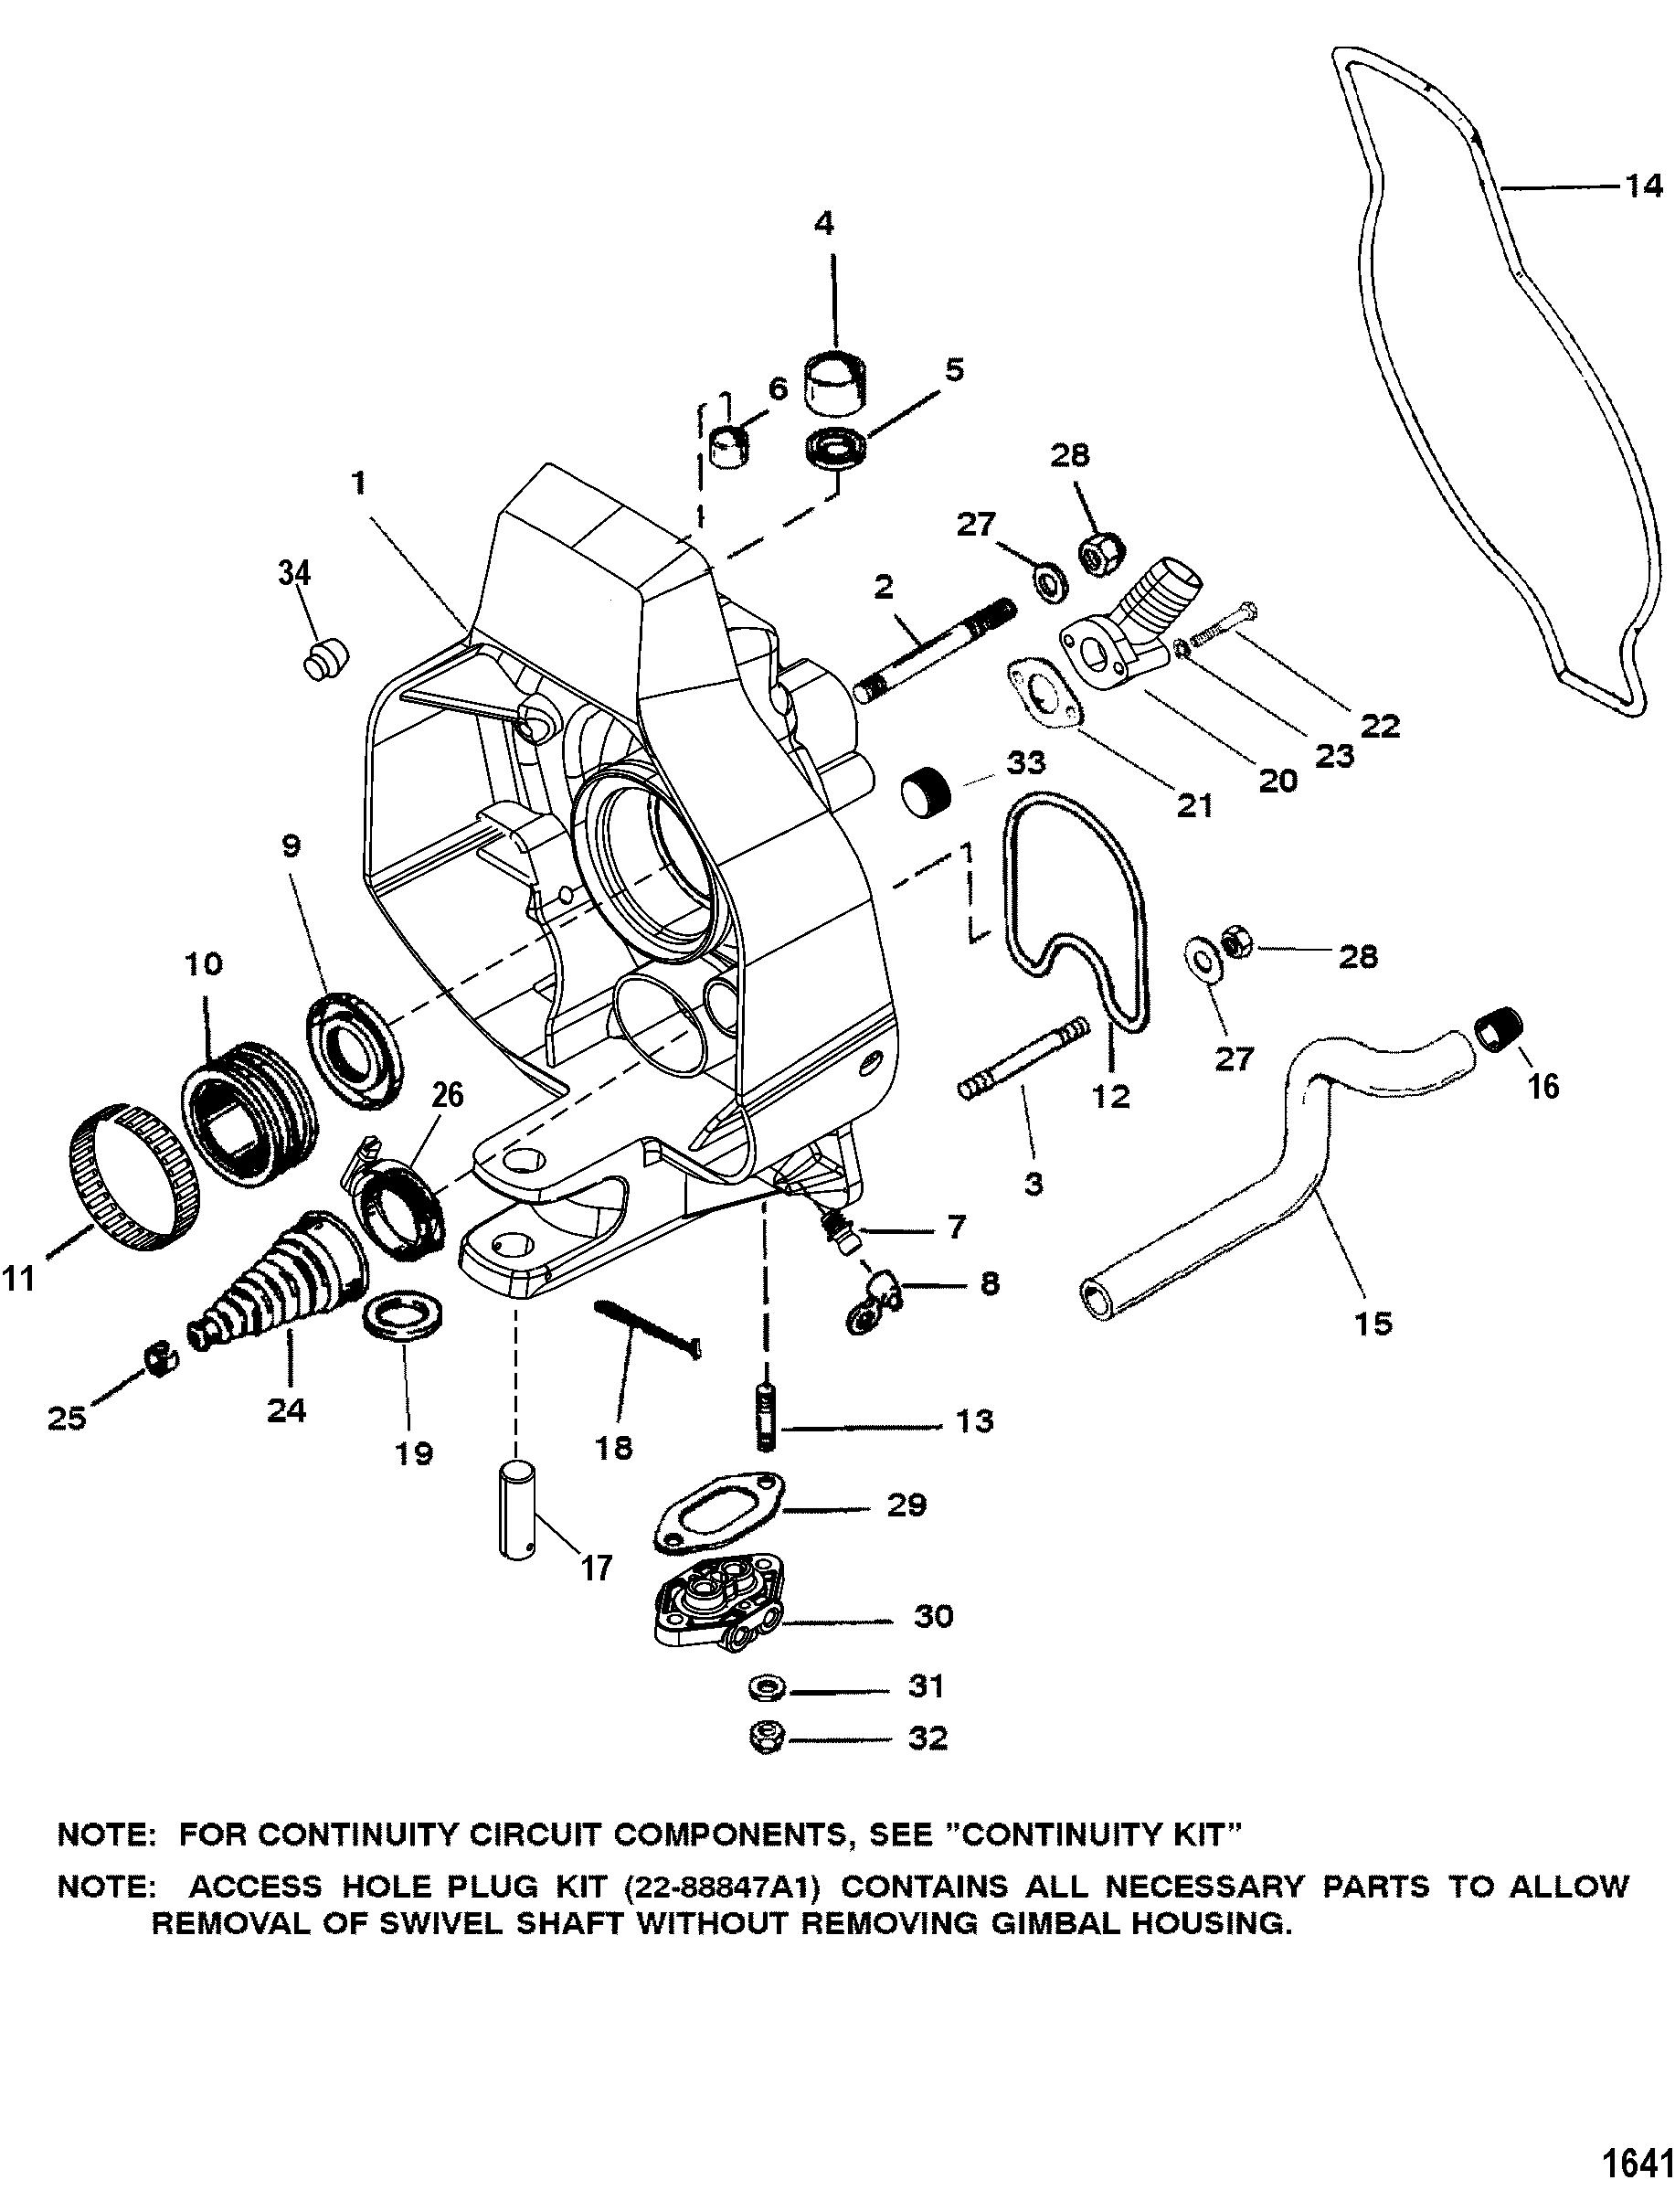 Gimbal Housing For Mercruiser Race Sterndrive Bravo I Xr Xz Sterndrive And Transom Assembly